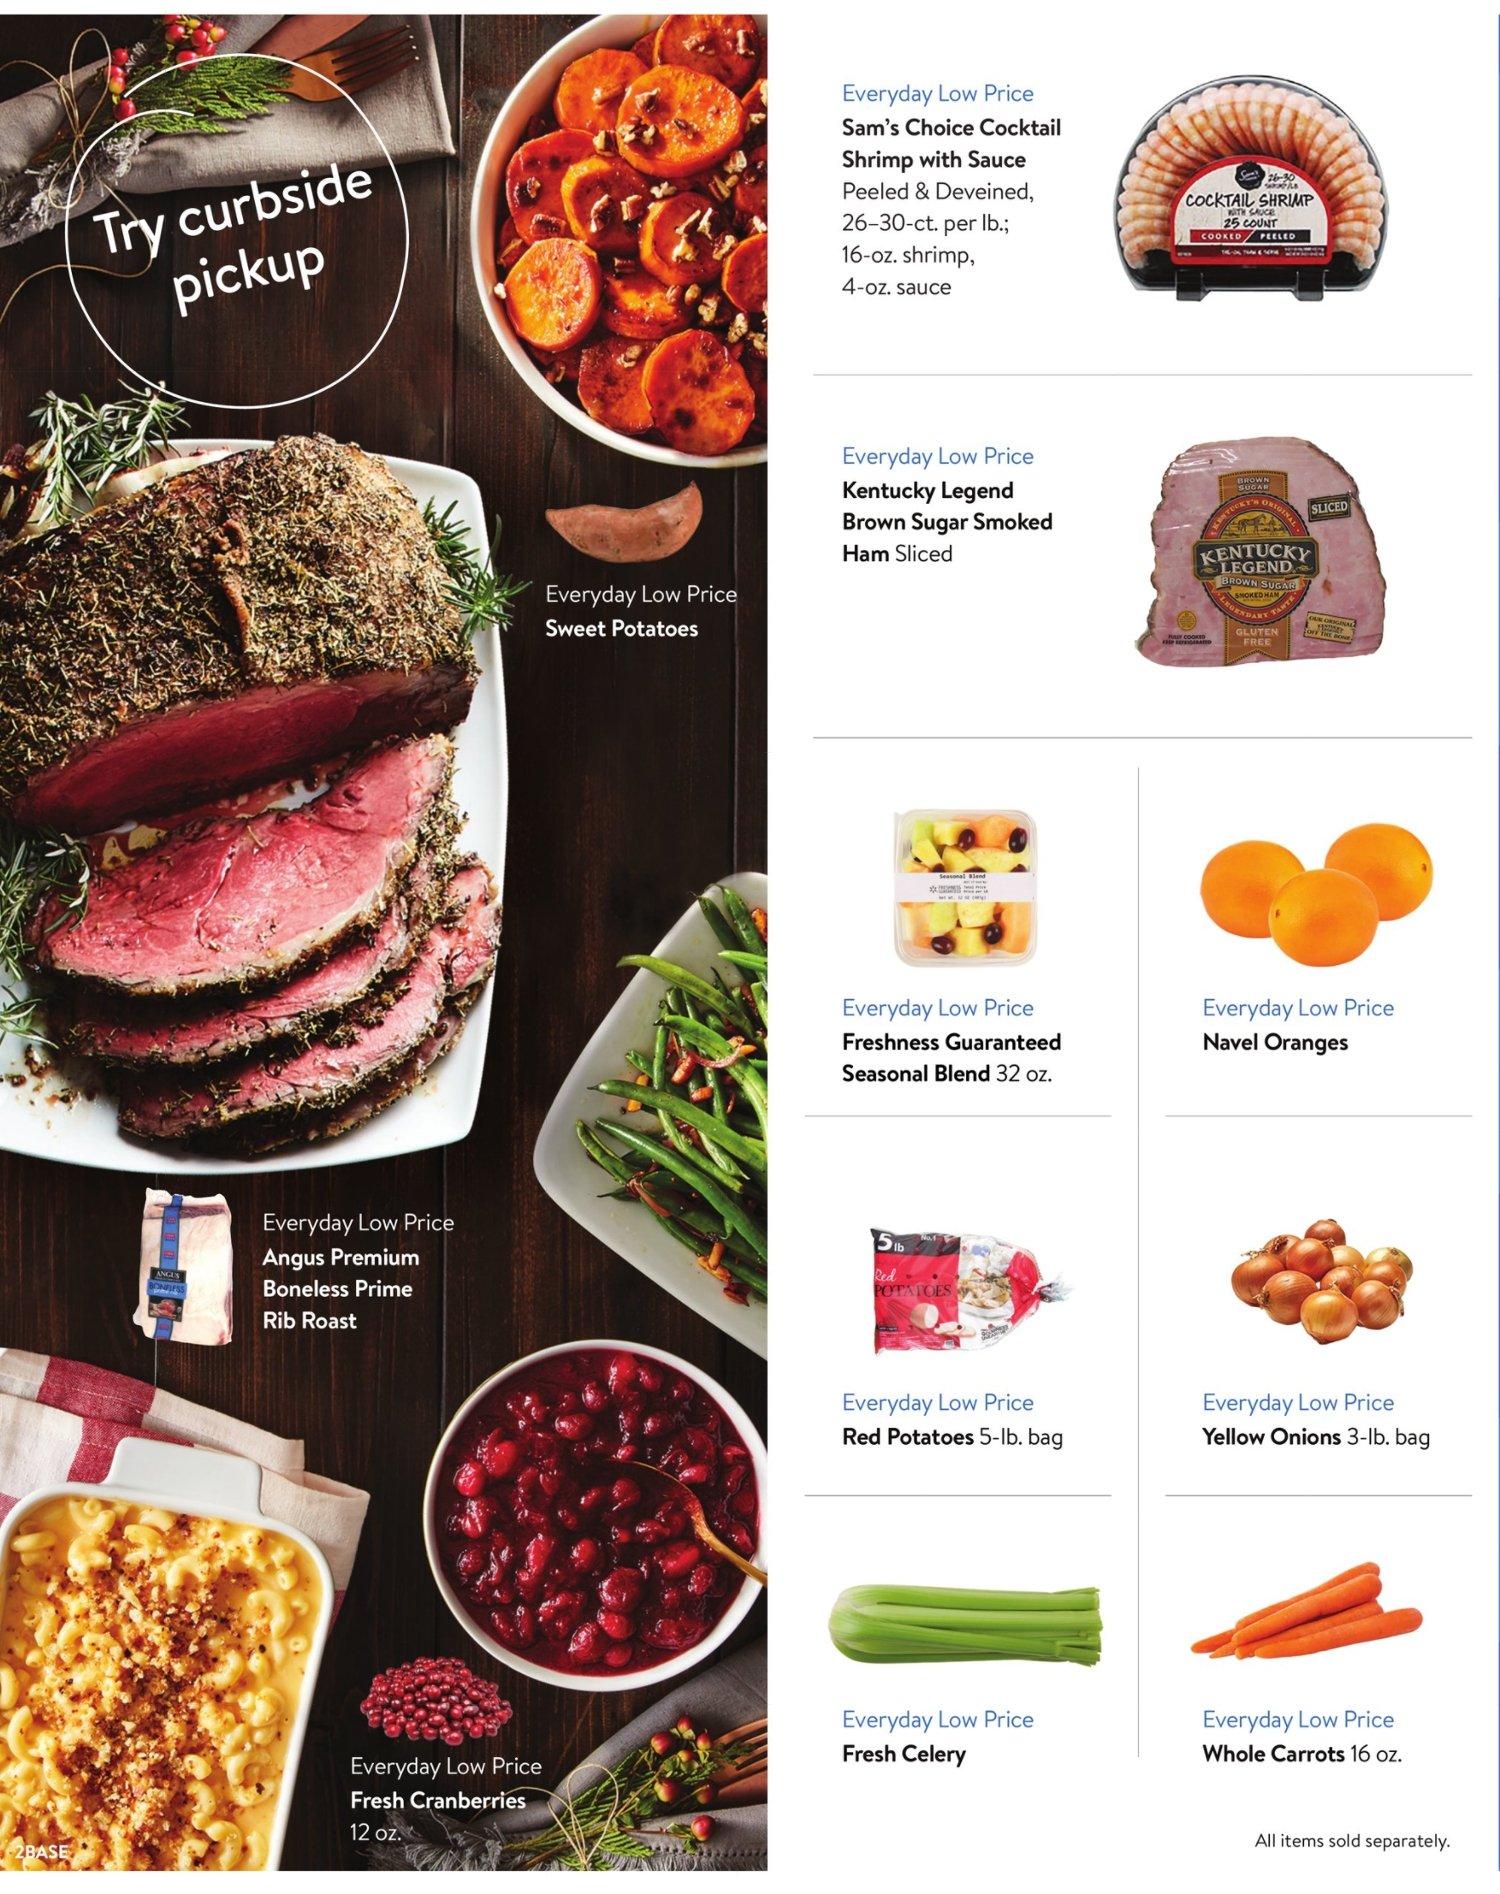 Walmart Weekly December 1 - 24, 2020 Page 2